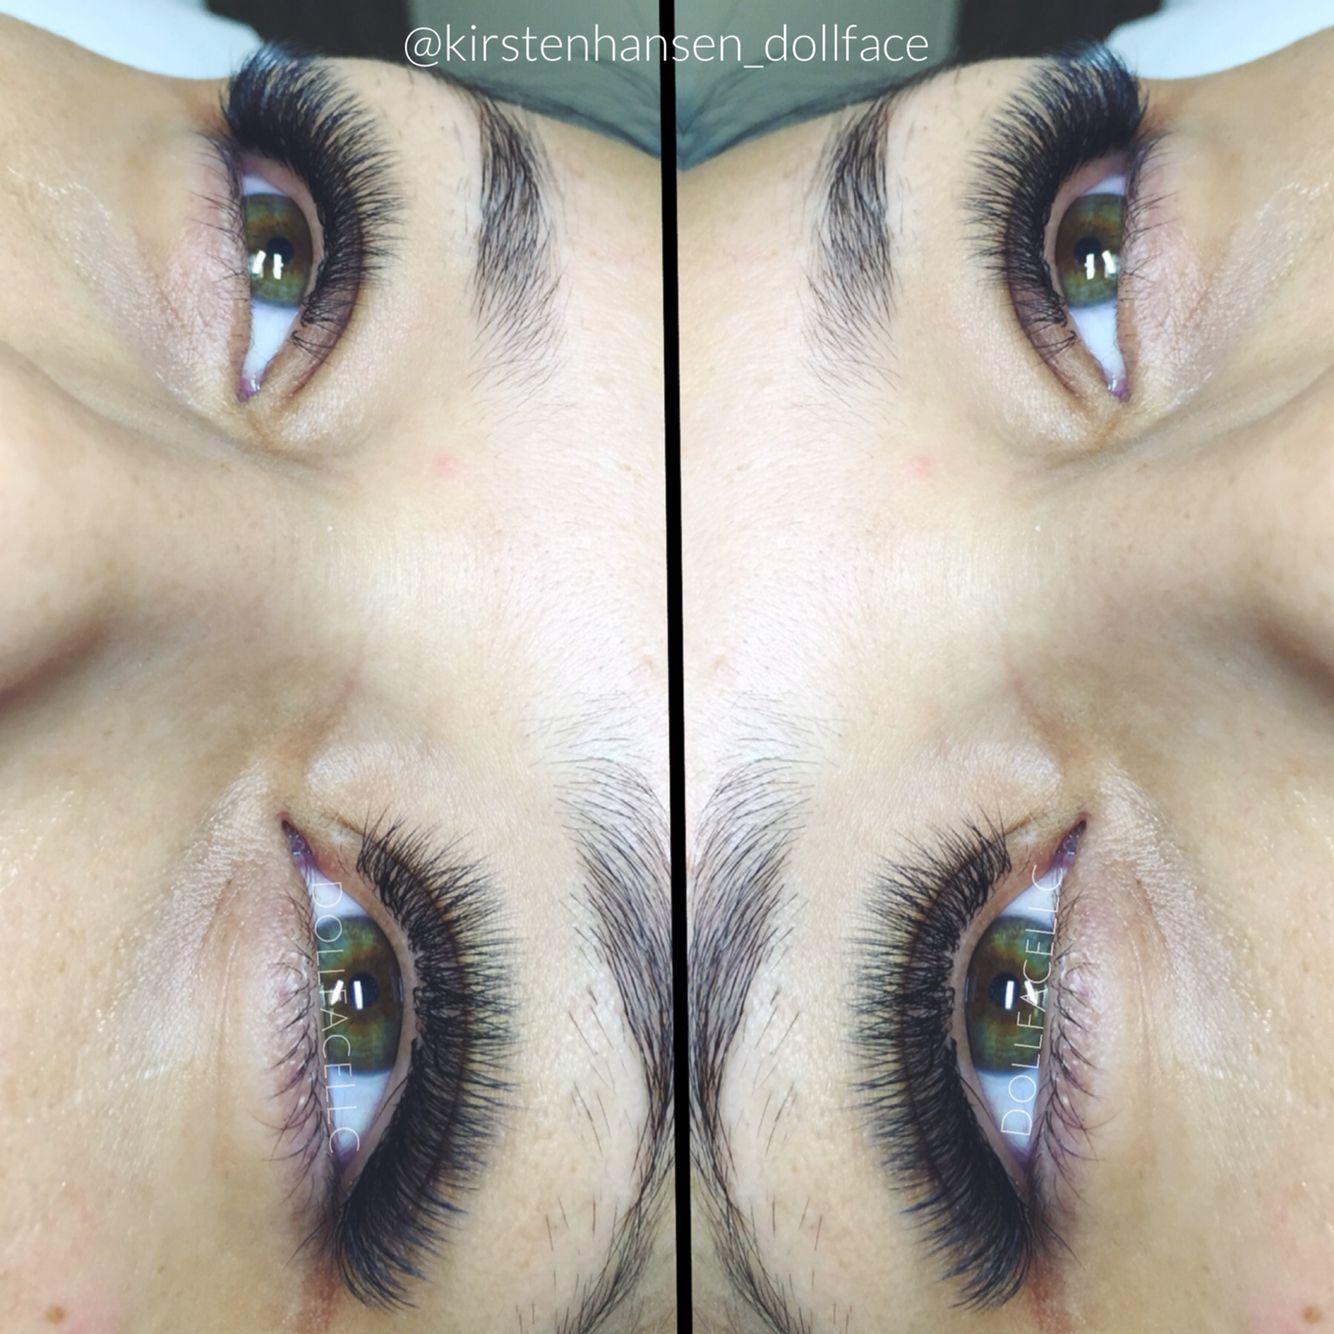 fe22ca1a7c4 Russian Volume Eyelash Extensions @kirstenhansen_dollface - Dollface Lashes  & Beauty. Houston, Tx